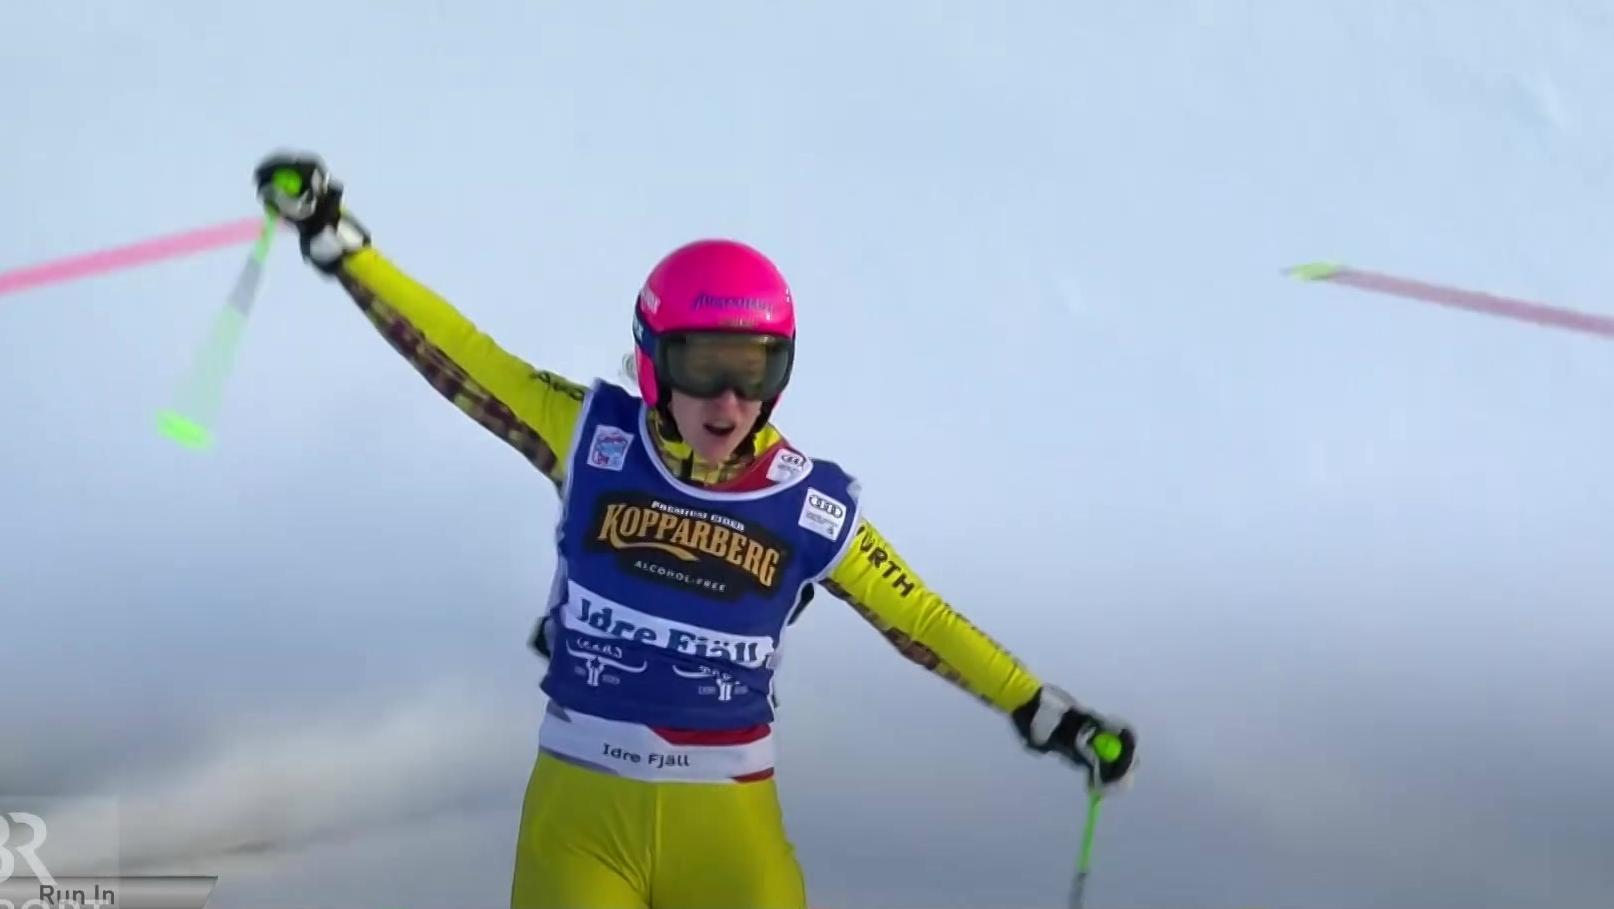 Skicrosserin Heidi Zacher